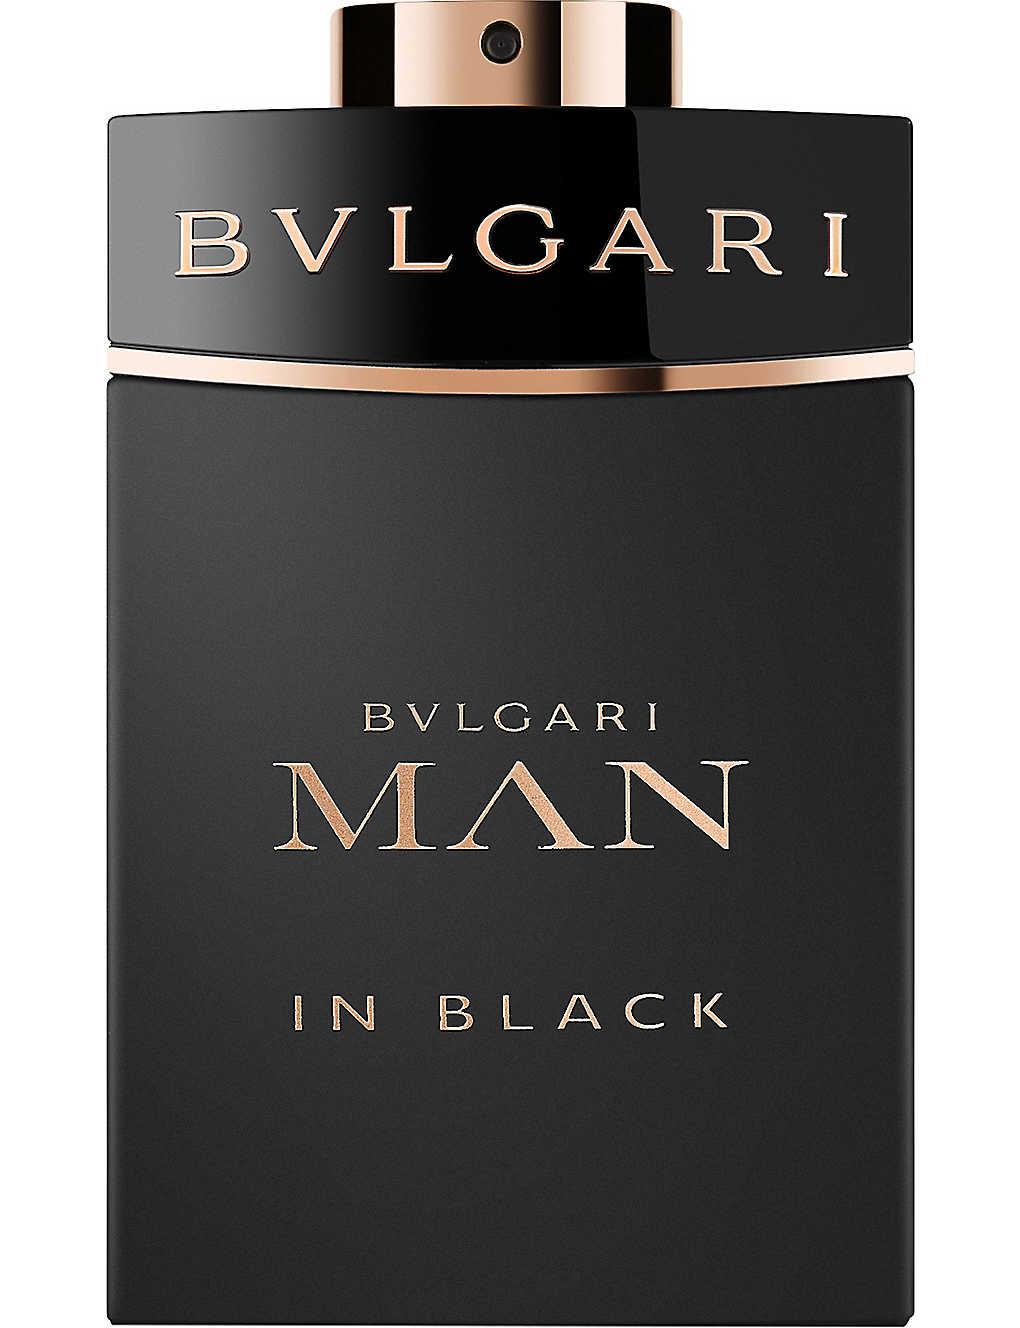 Bvlgari Man In Black Eau De Parfum 150ml Edp 100ml No Recent Searches